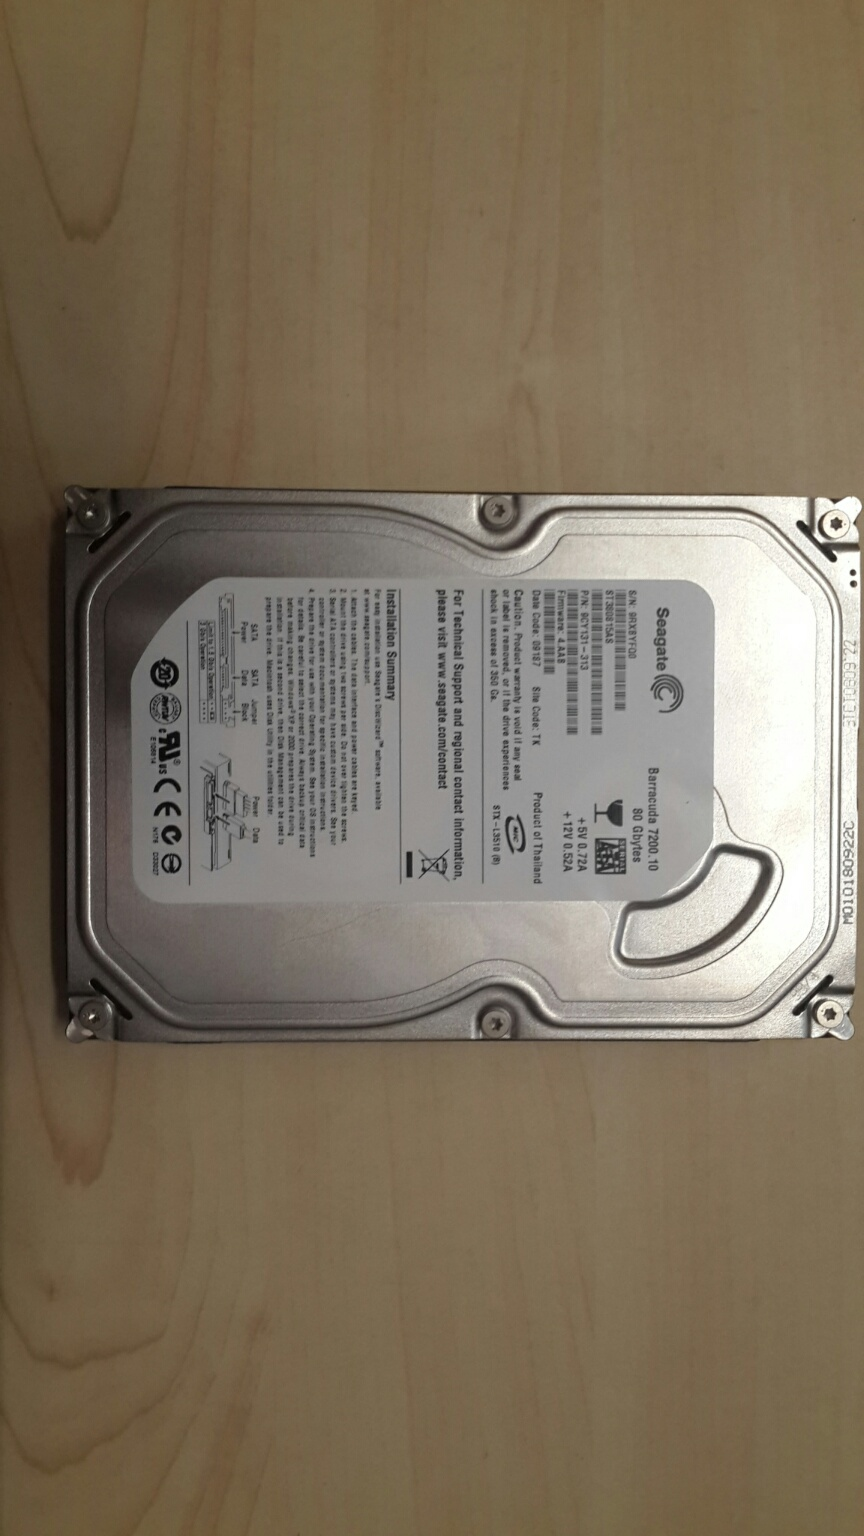 Seagate Barracuda 7200 SATA 80GB Hard Disk Drive - New